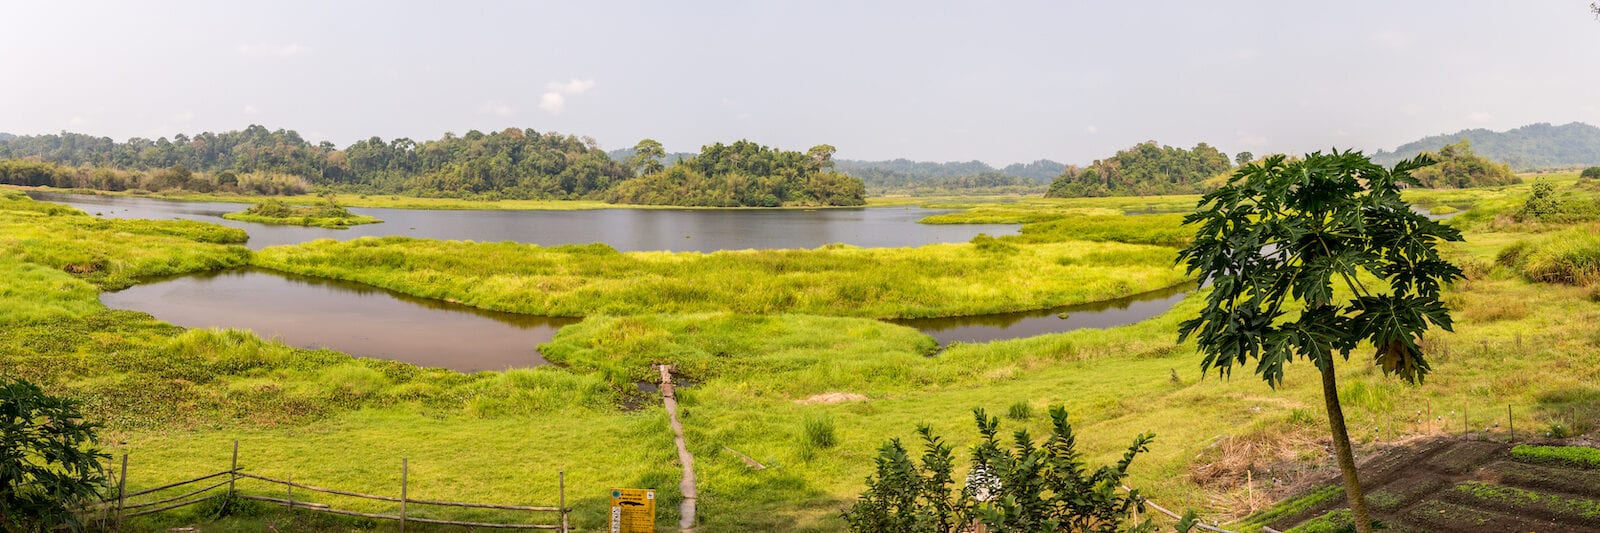 Cát Tiên National Park, VN